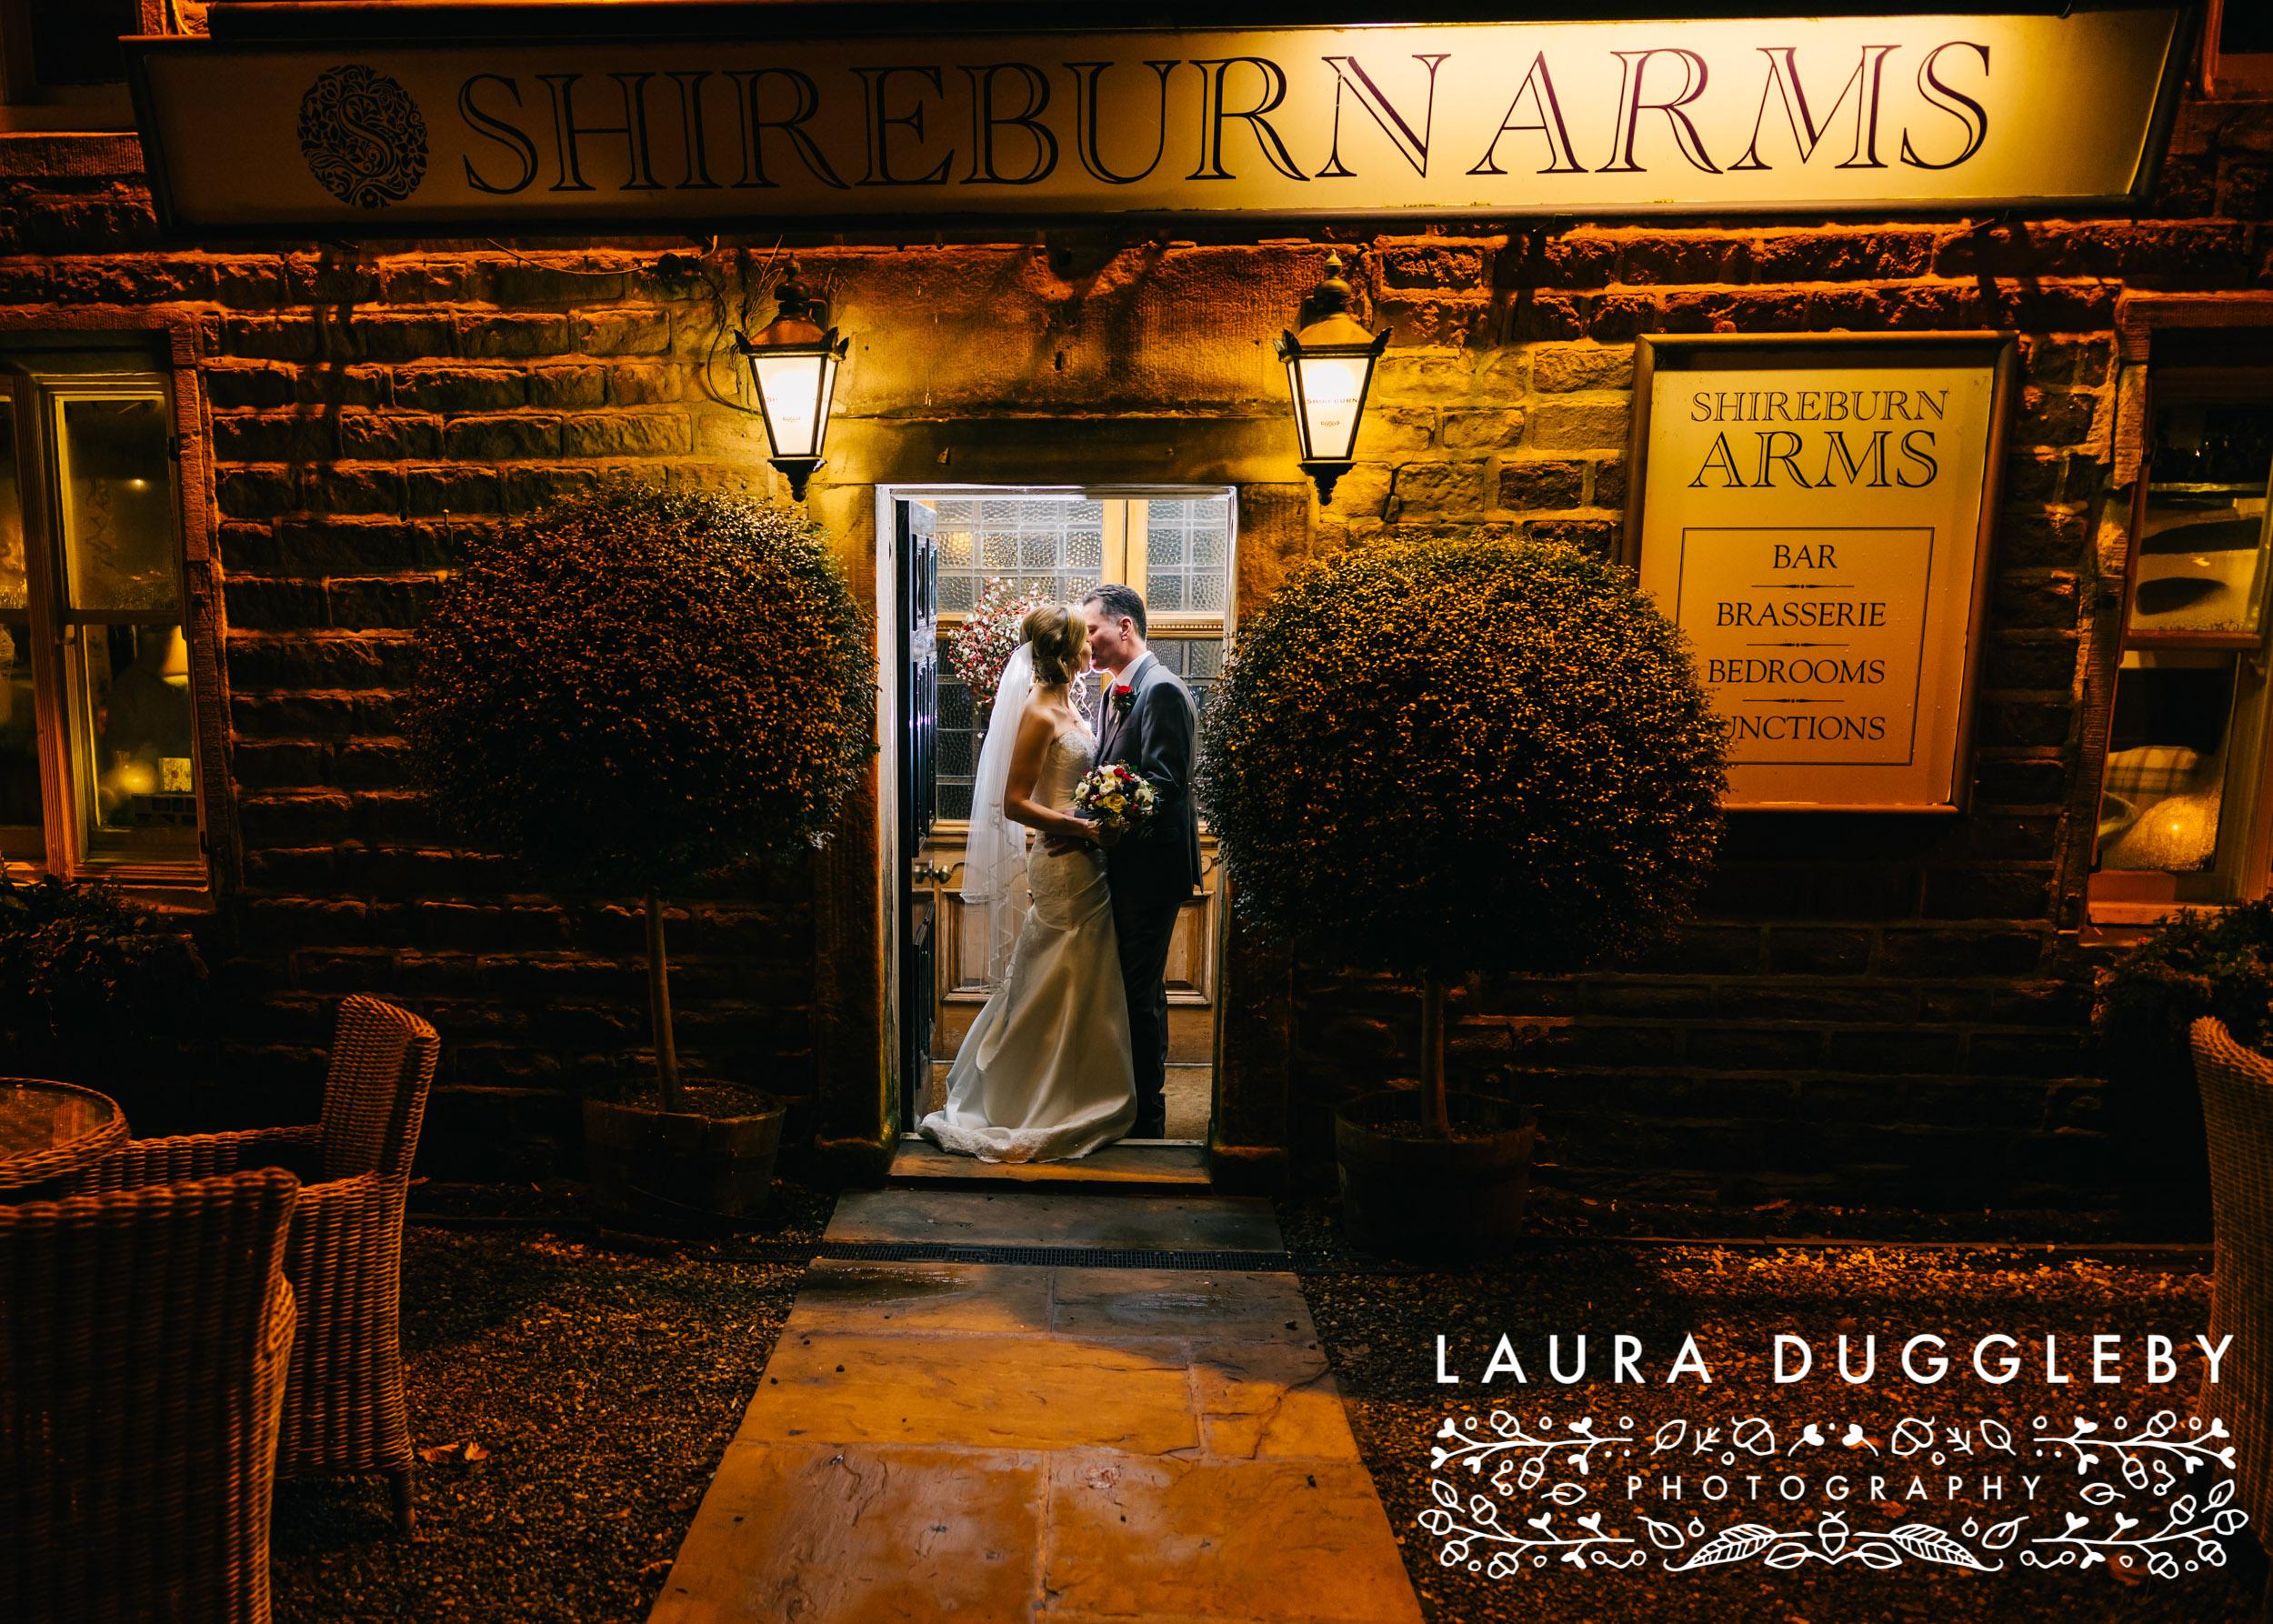 Shireburn Arms Wedding Night-time Portrait